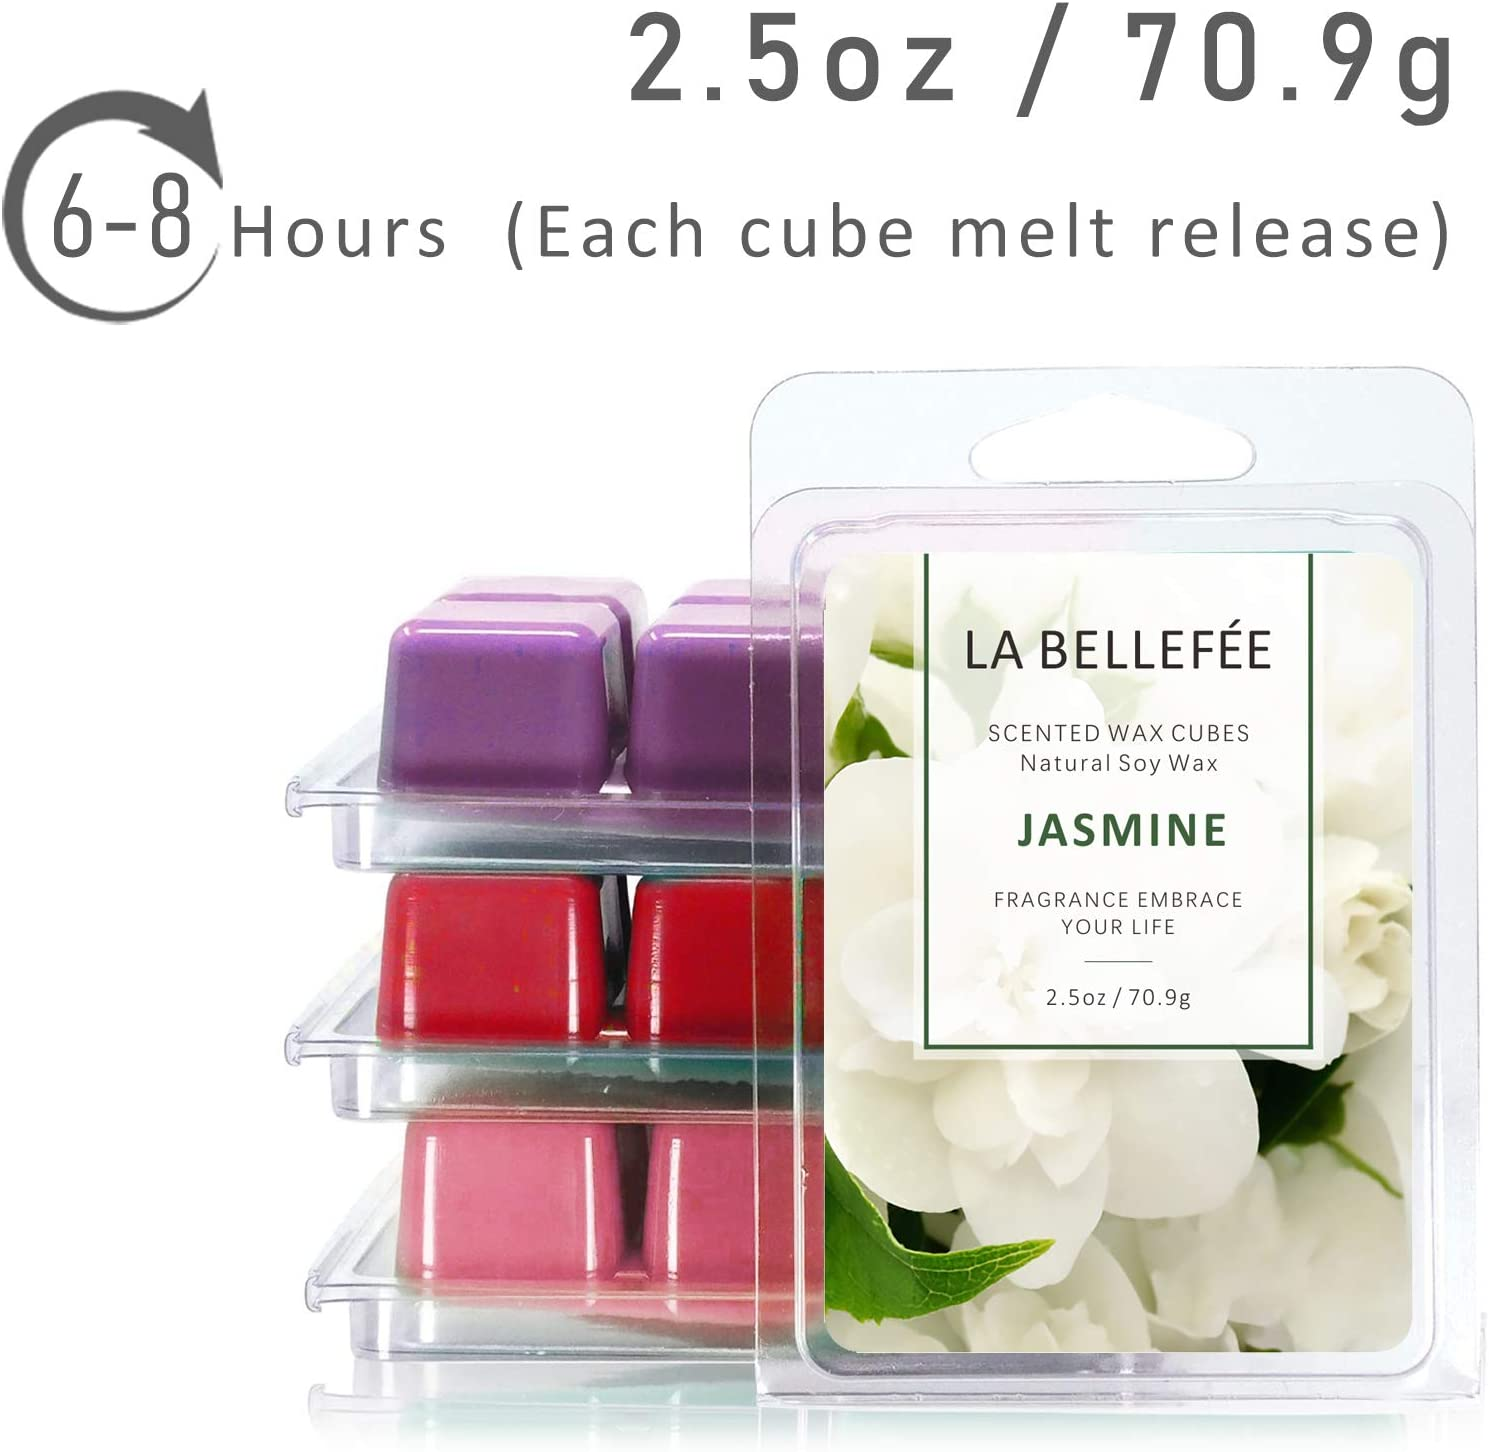 Wax MeltsBeeswax MeltsWax TartsWax CubesScented Wax MeltsHome FragranceHandmadeStocking StufferGifts